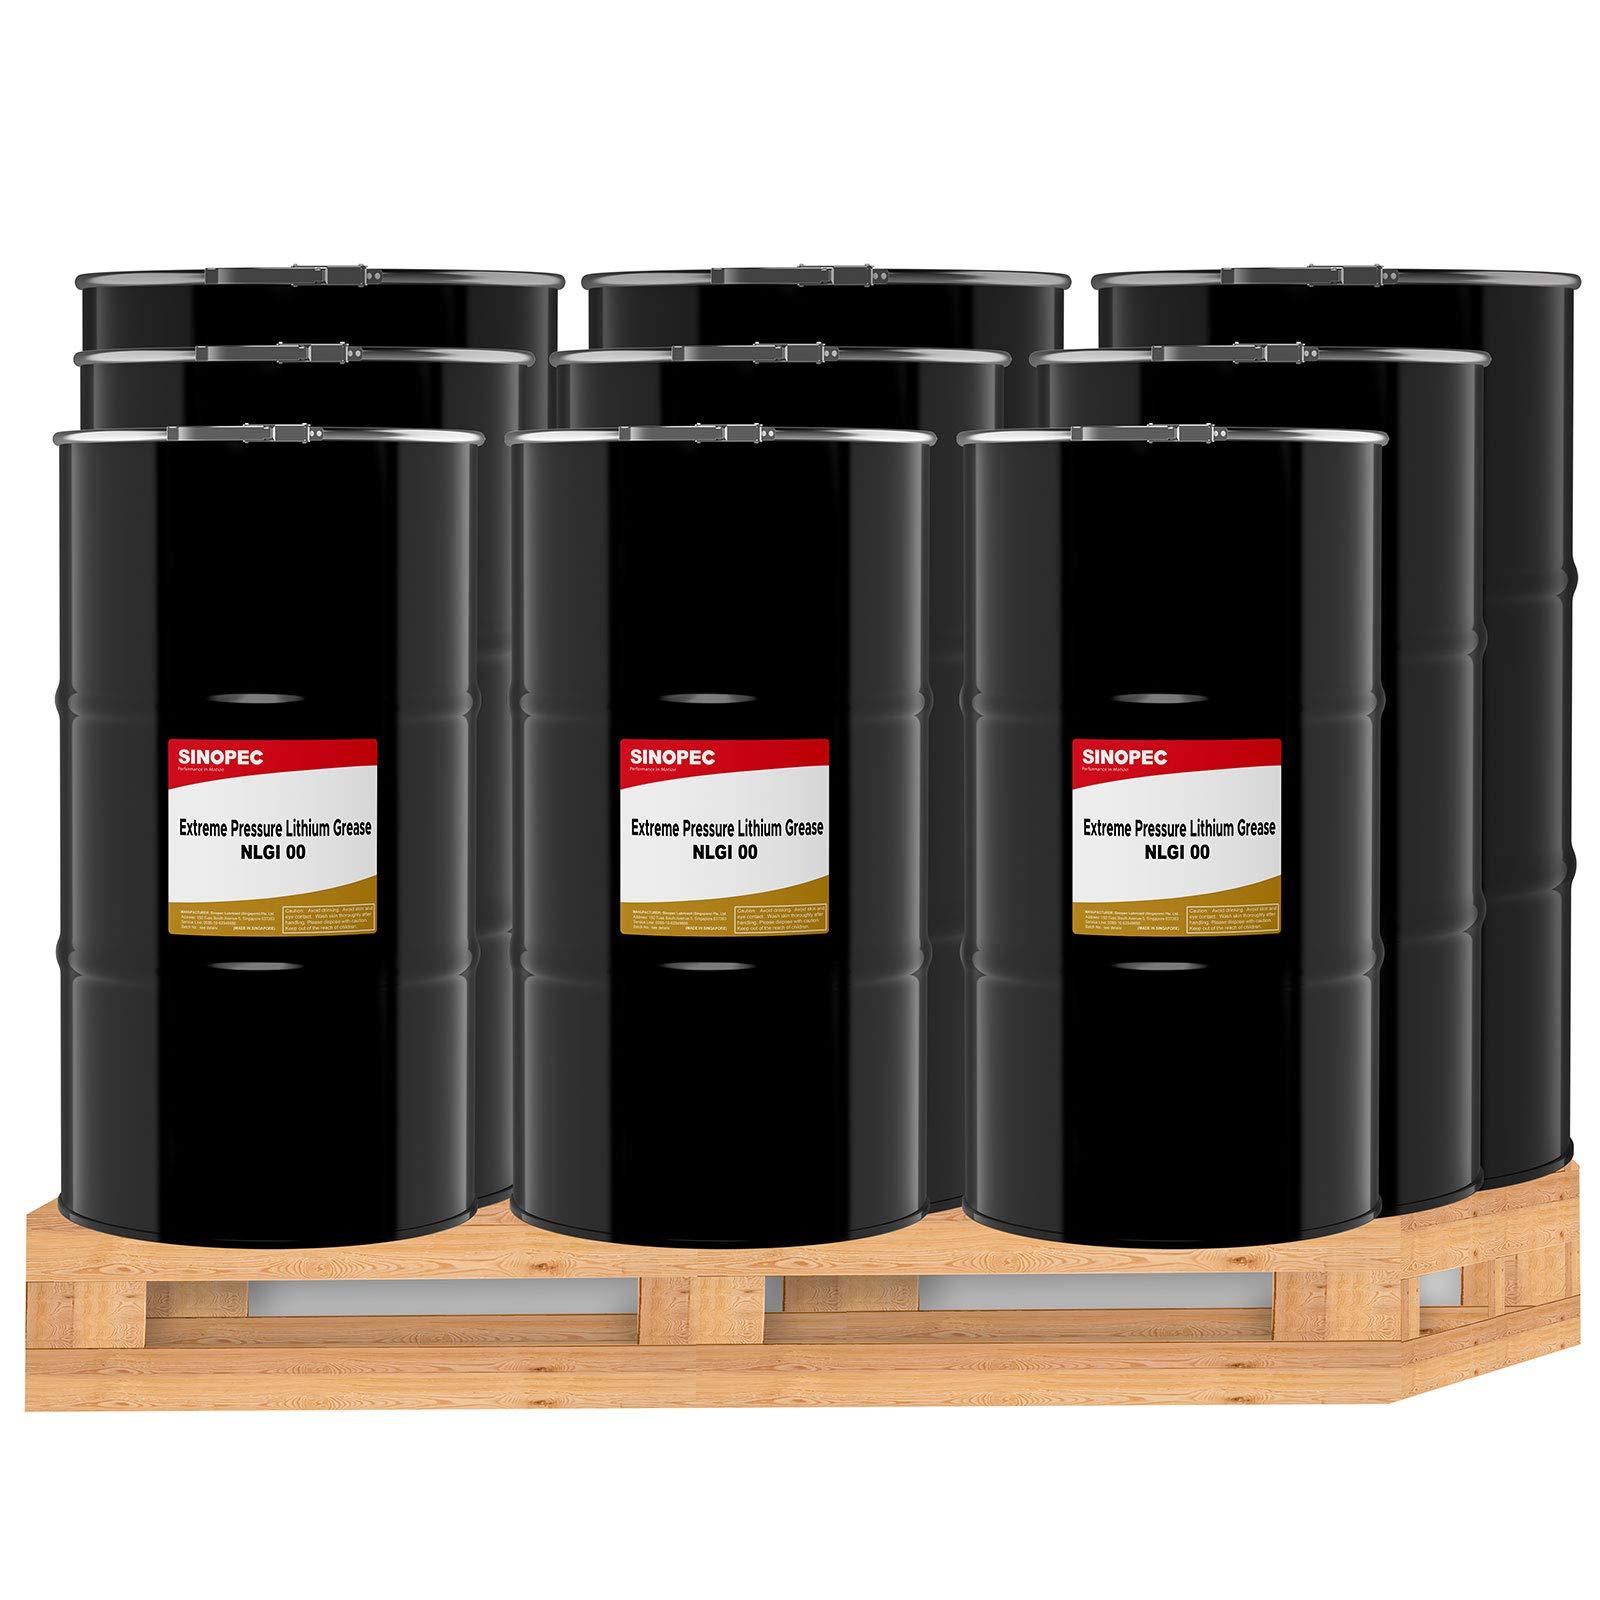 Sinopec (EP00 Extreme Pressure Multipurpose Lithium Grease, NLGI 00 - (9) 120LB. (16 Gallon) Kegs